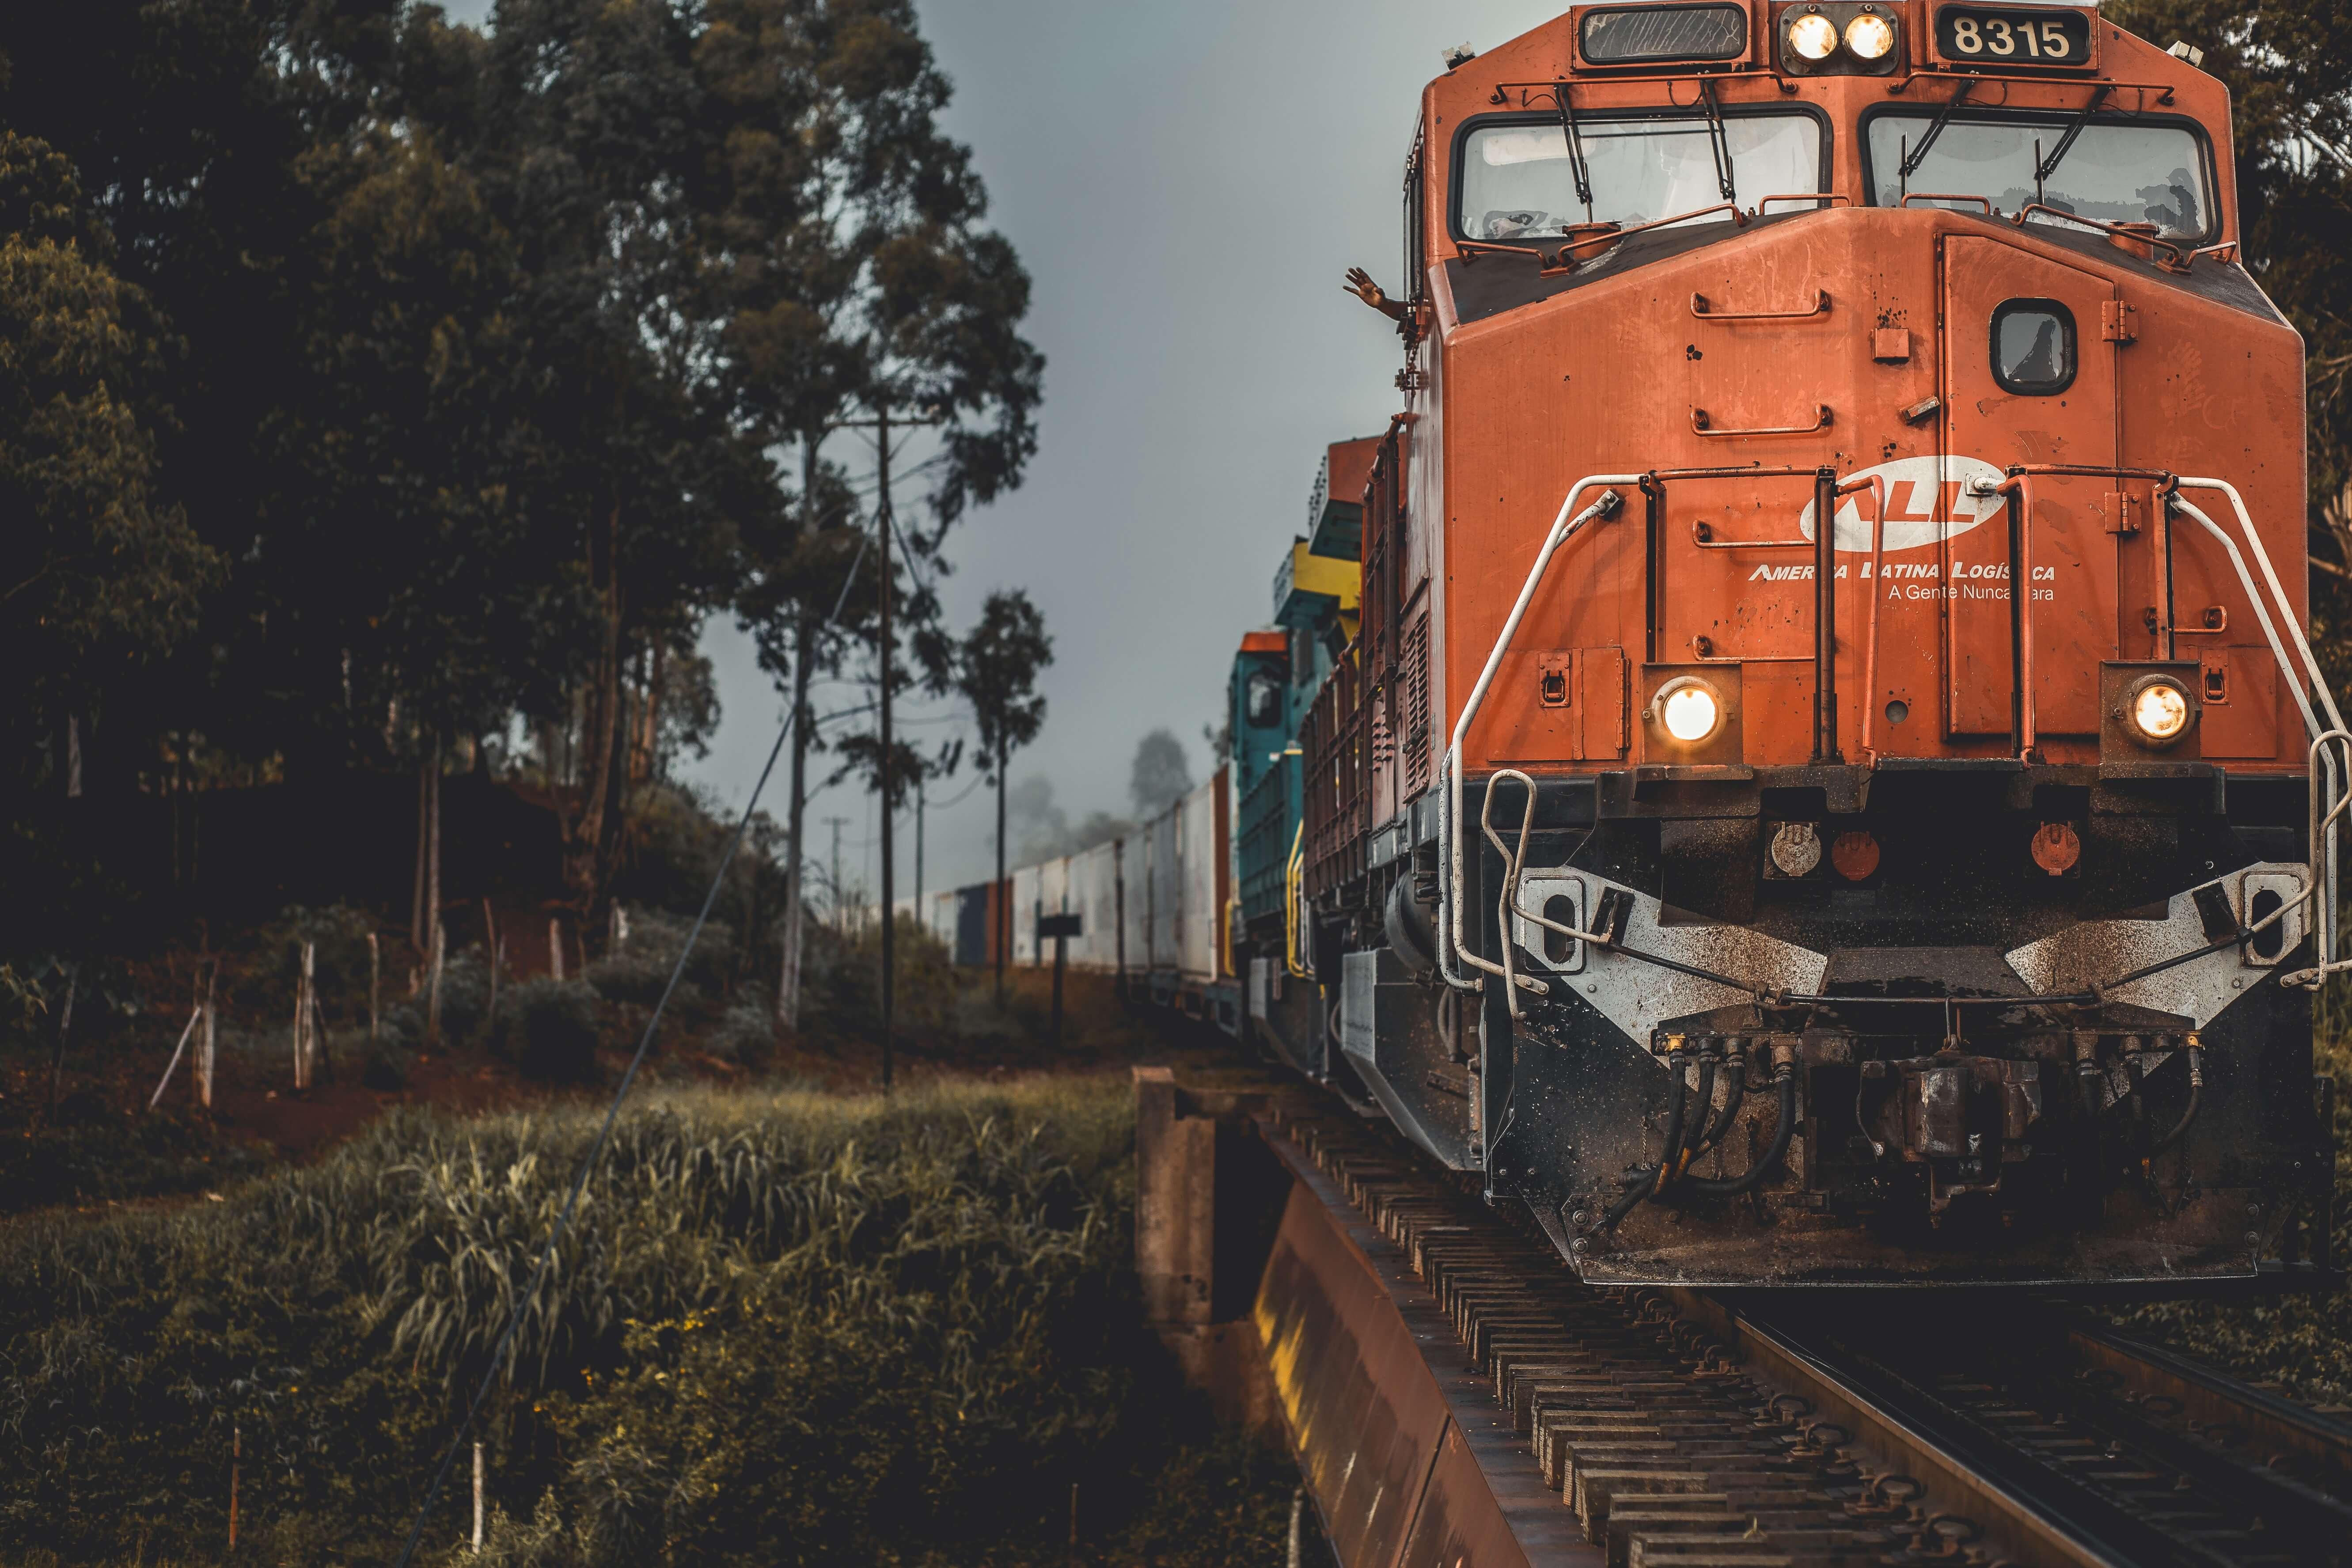 multi-modal transportation via rail